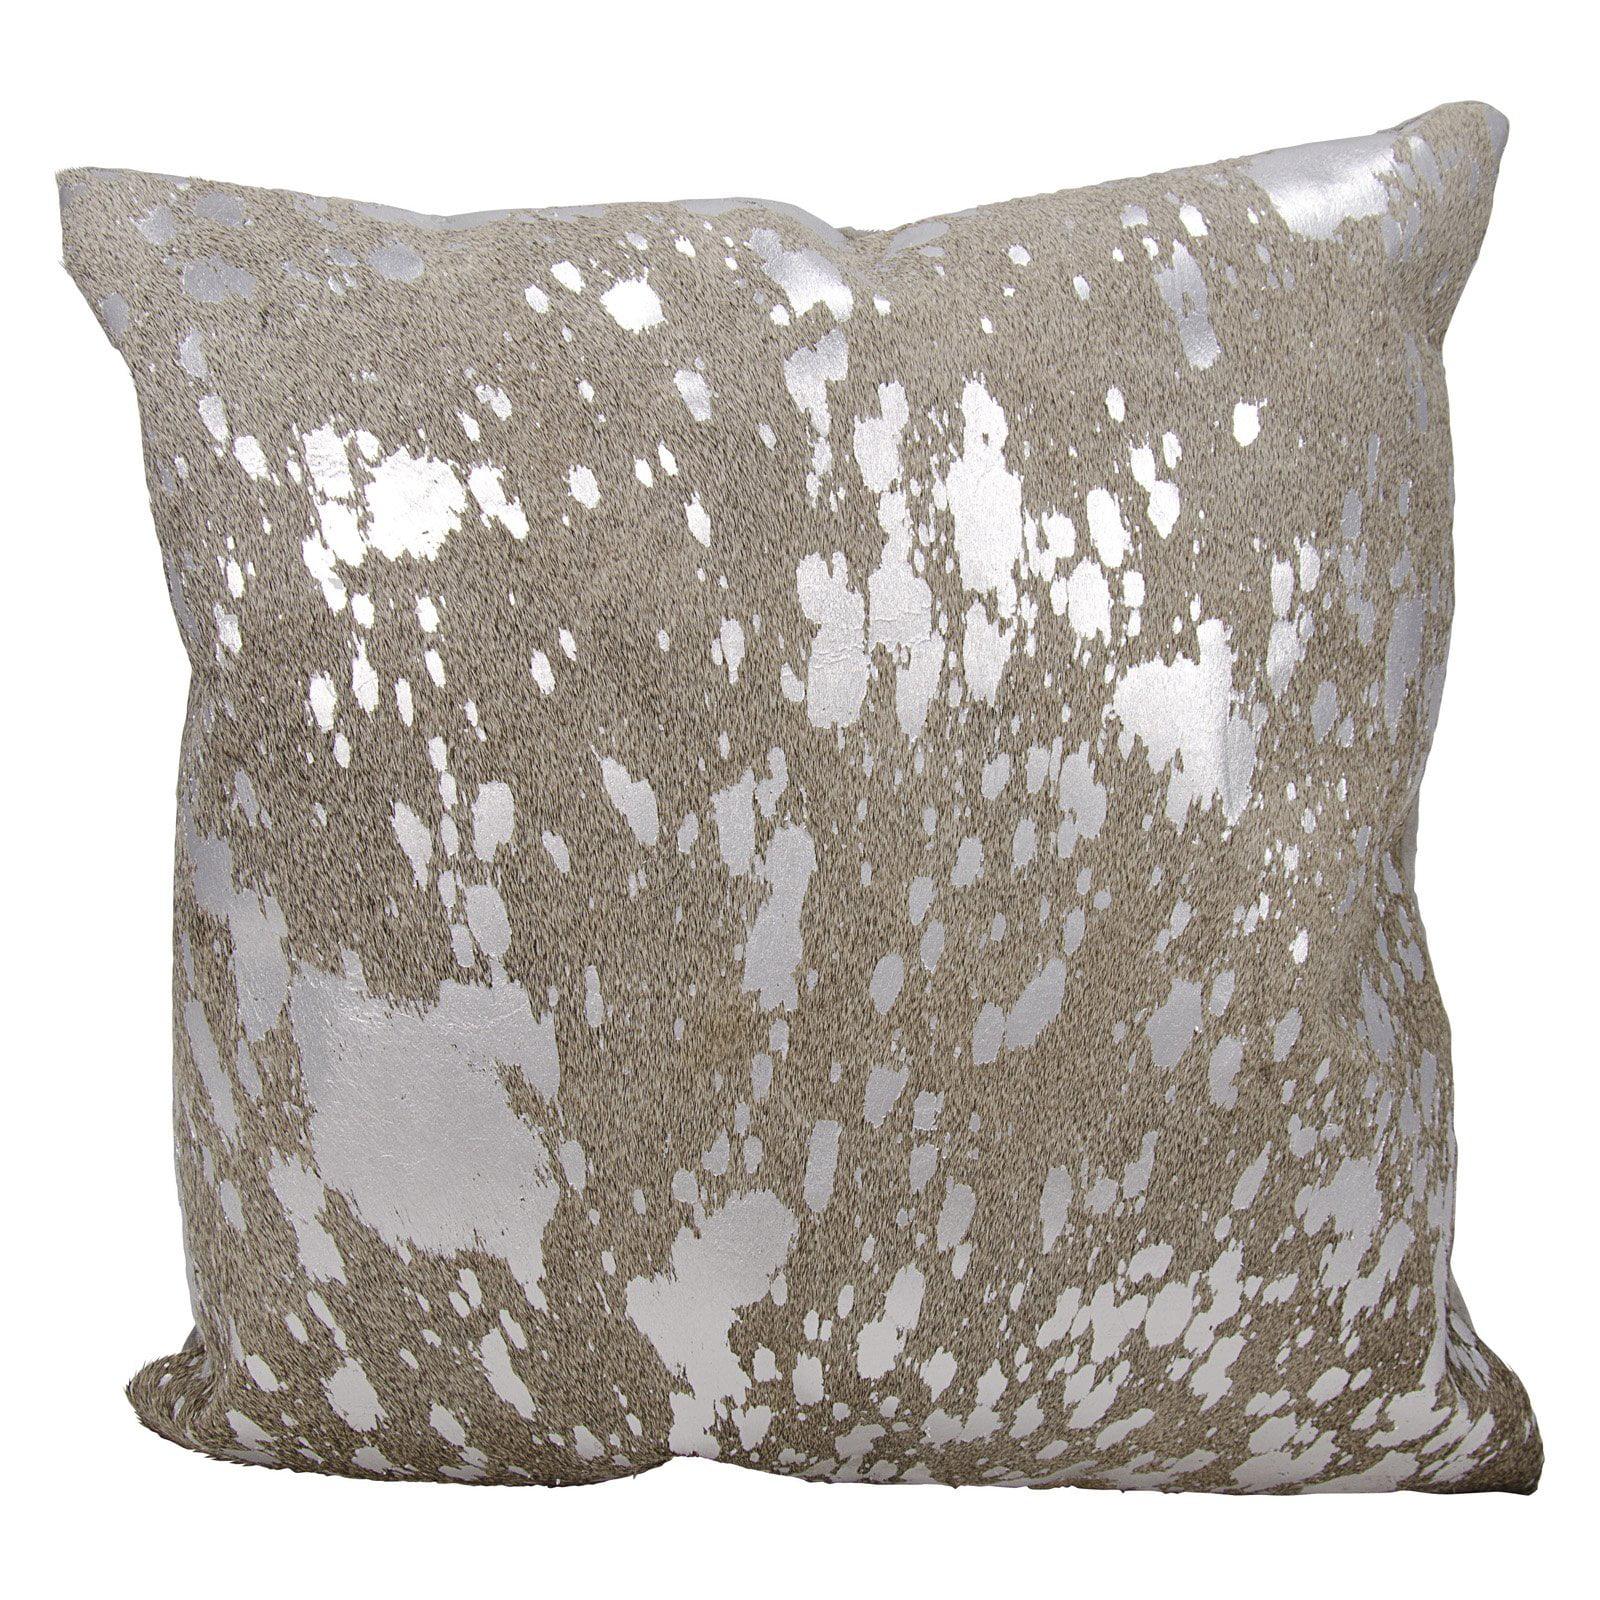 Nourison Couture Natural Hide Metallic Splash Grey/Silver Throw Pillow